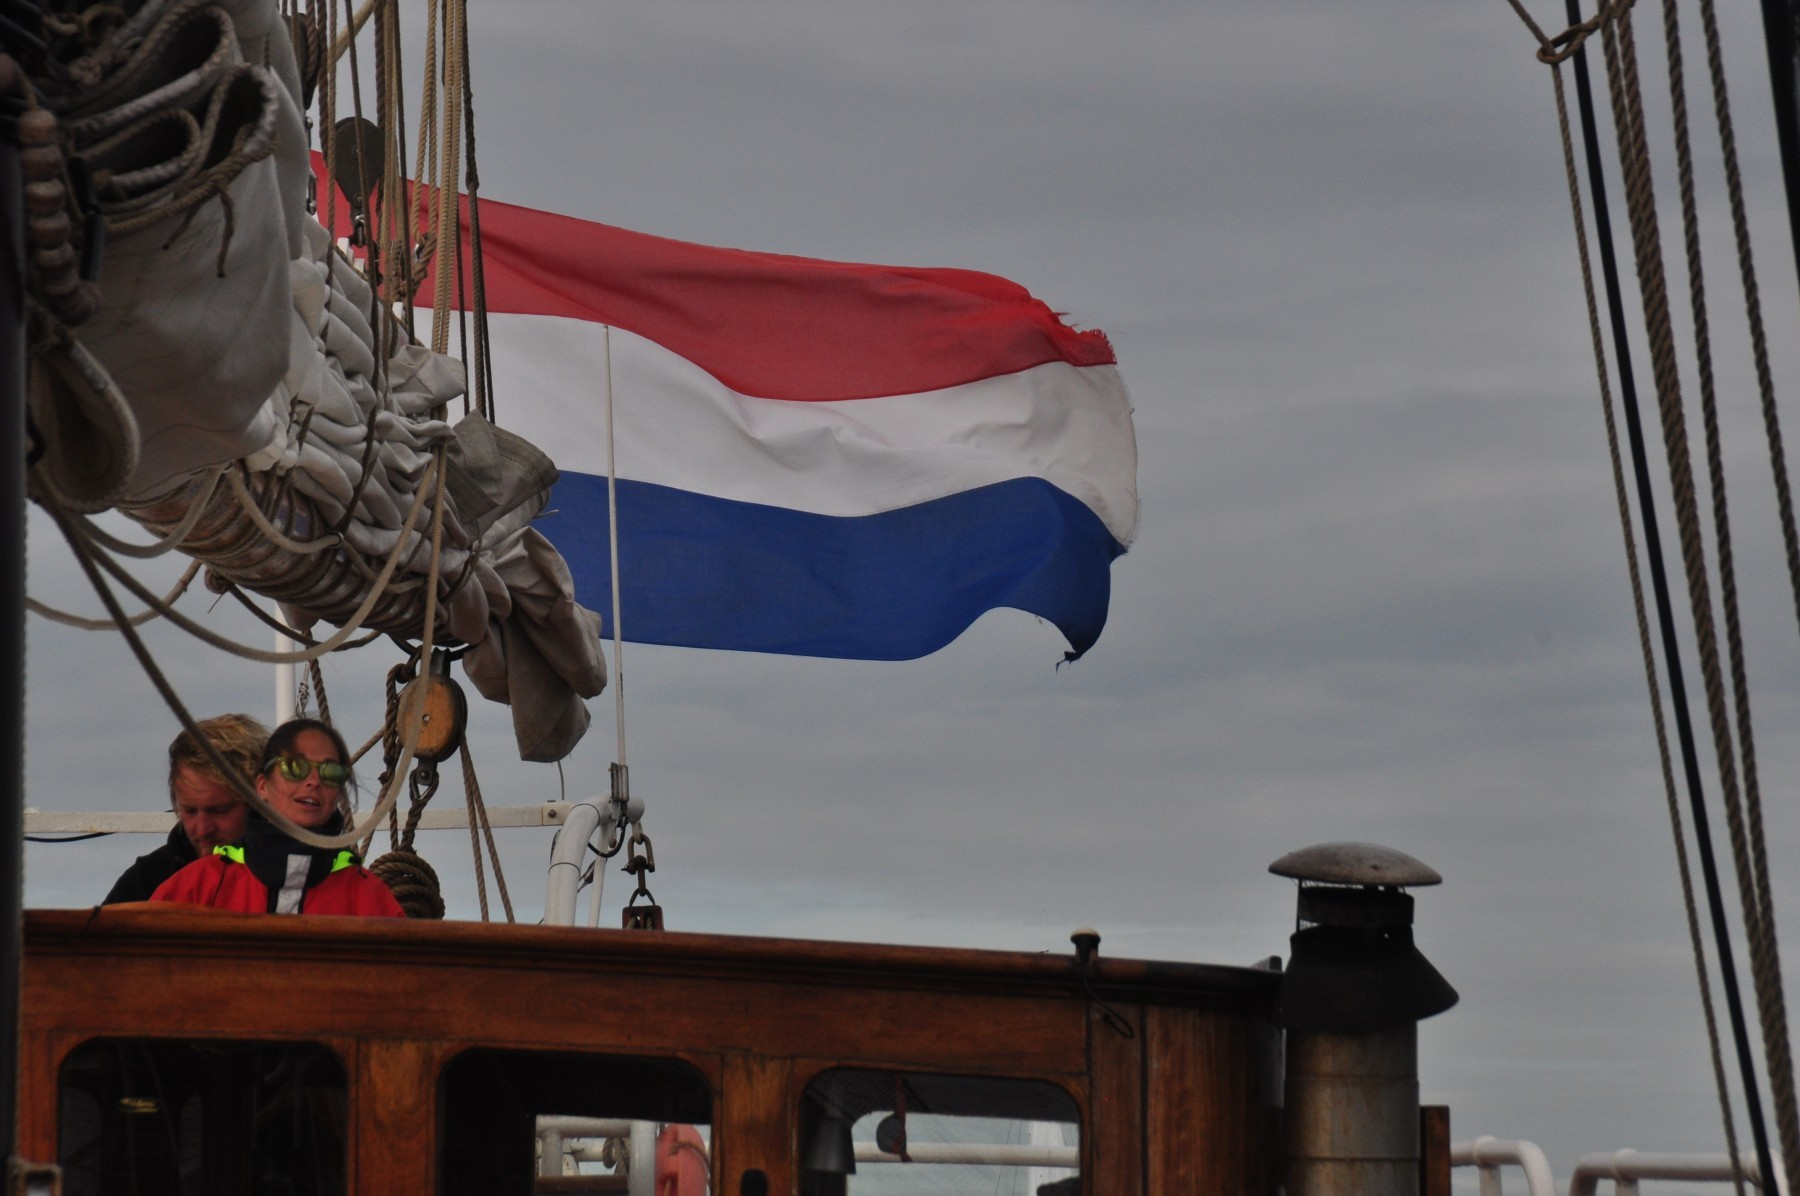 Wochenende segeln - ABEL TASMAN